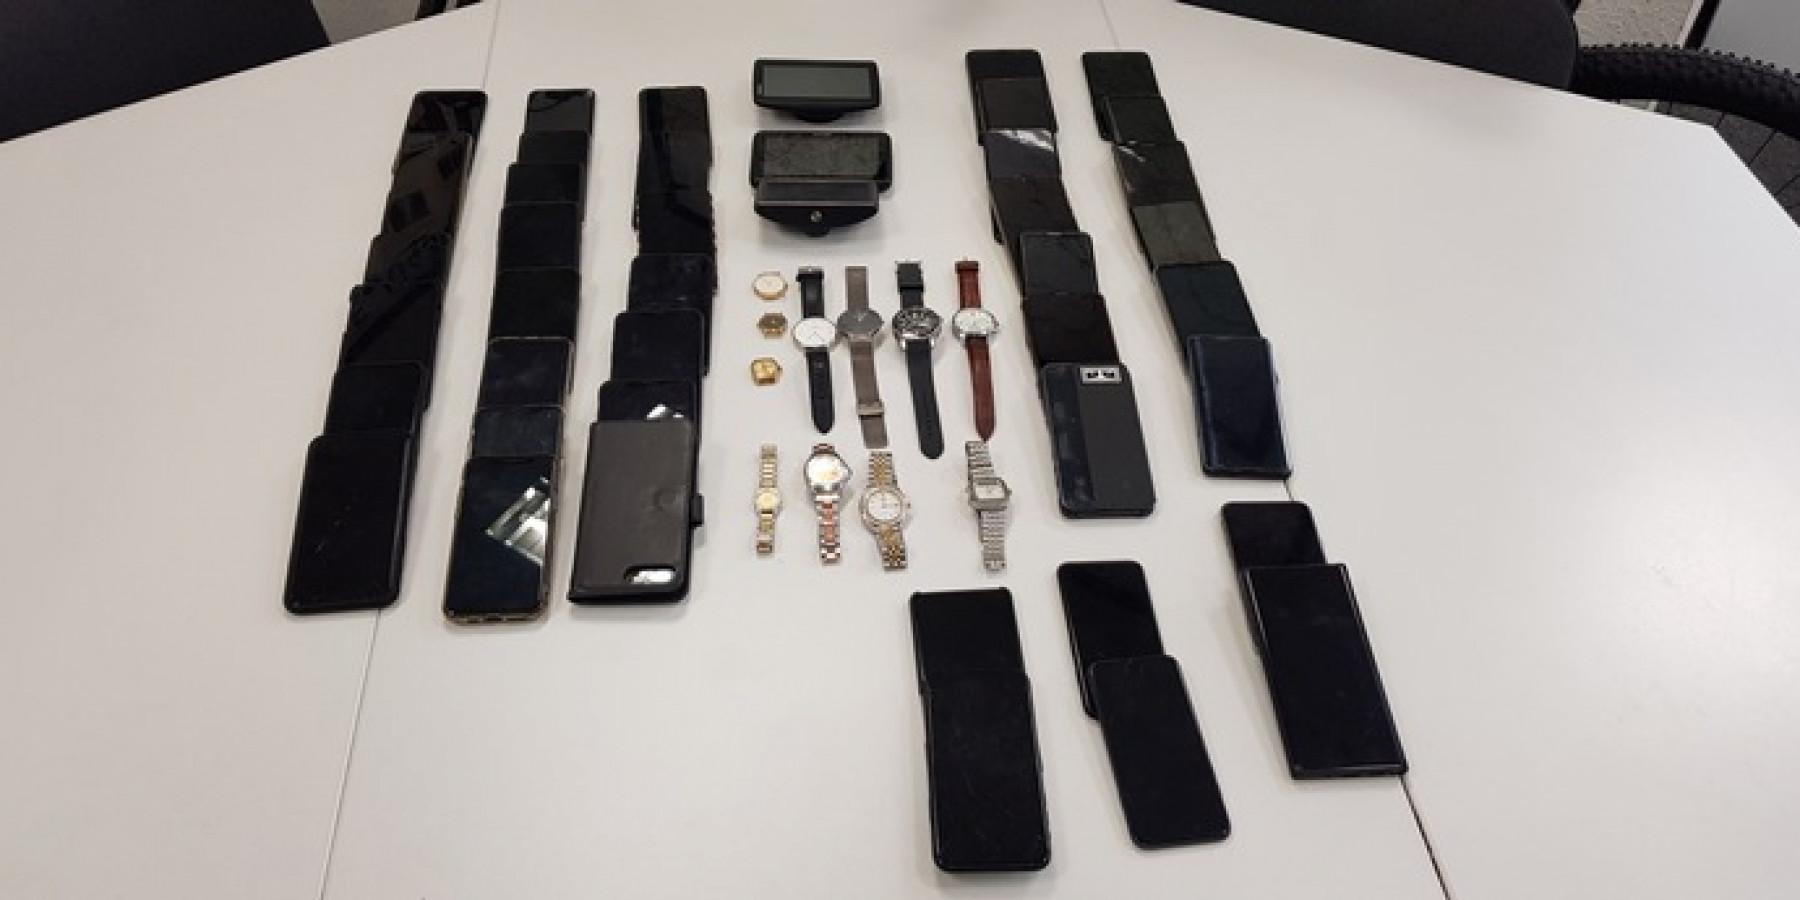 Polizisten finden in Kleintransporter 15 gestohlene Mobiltelefone